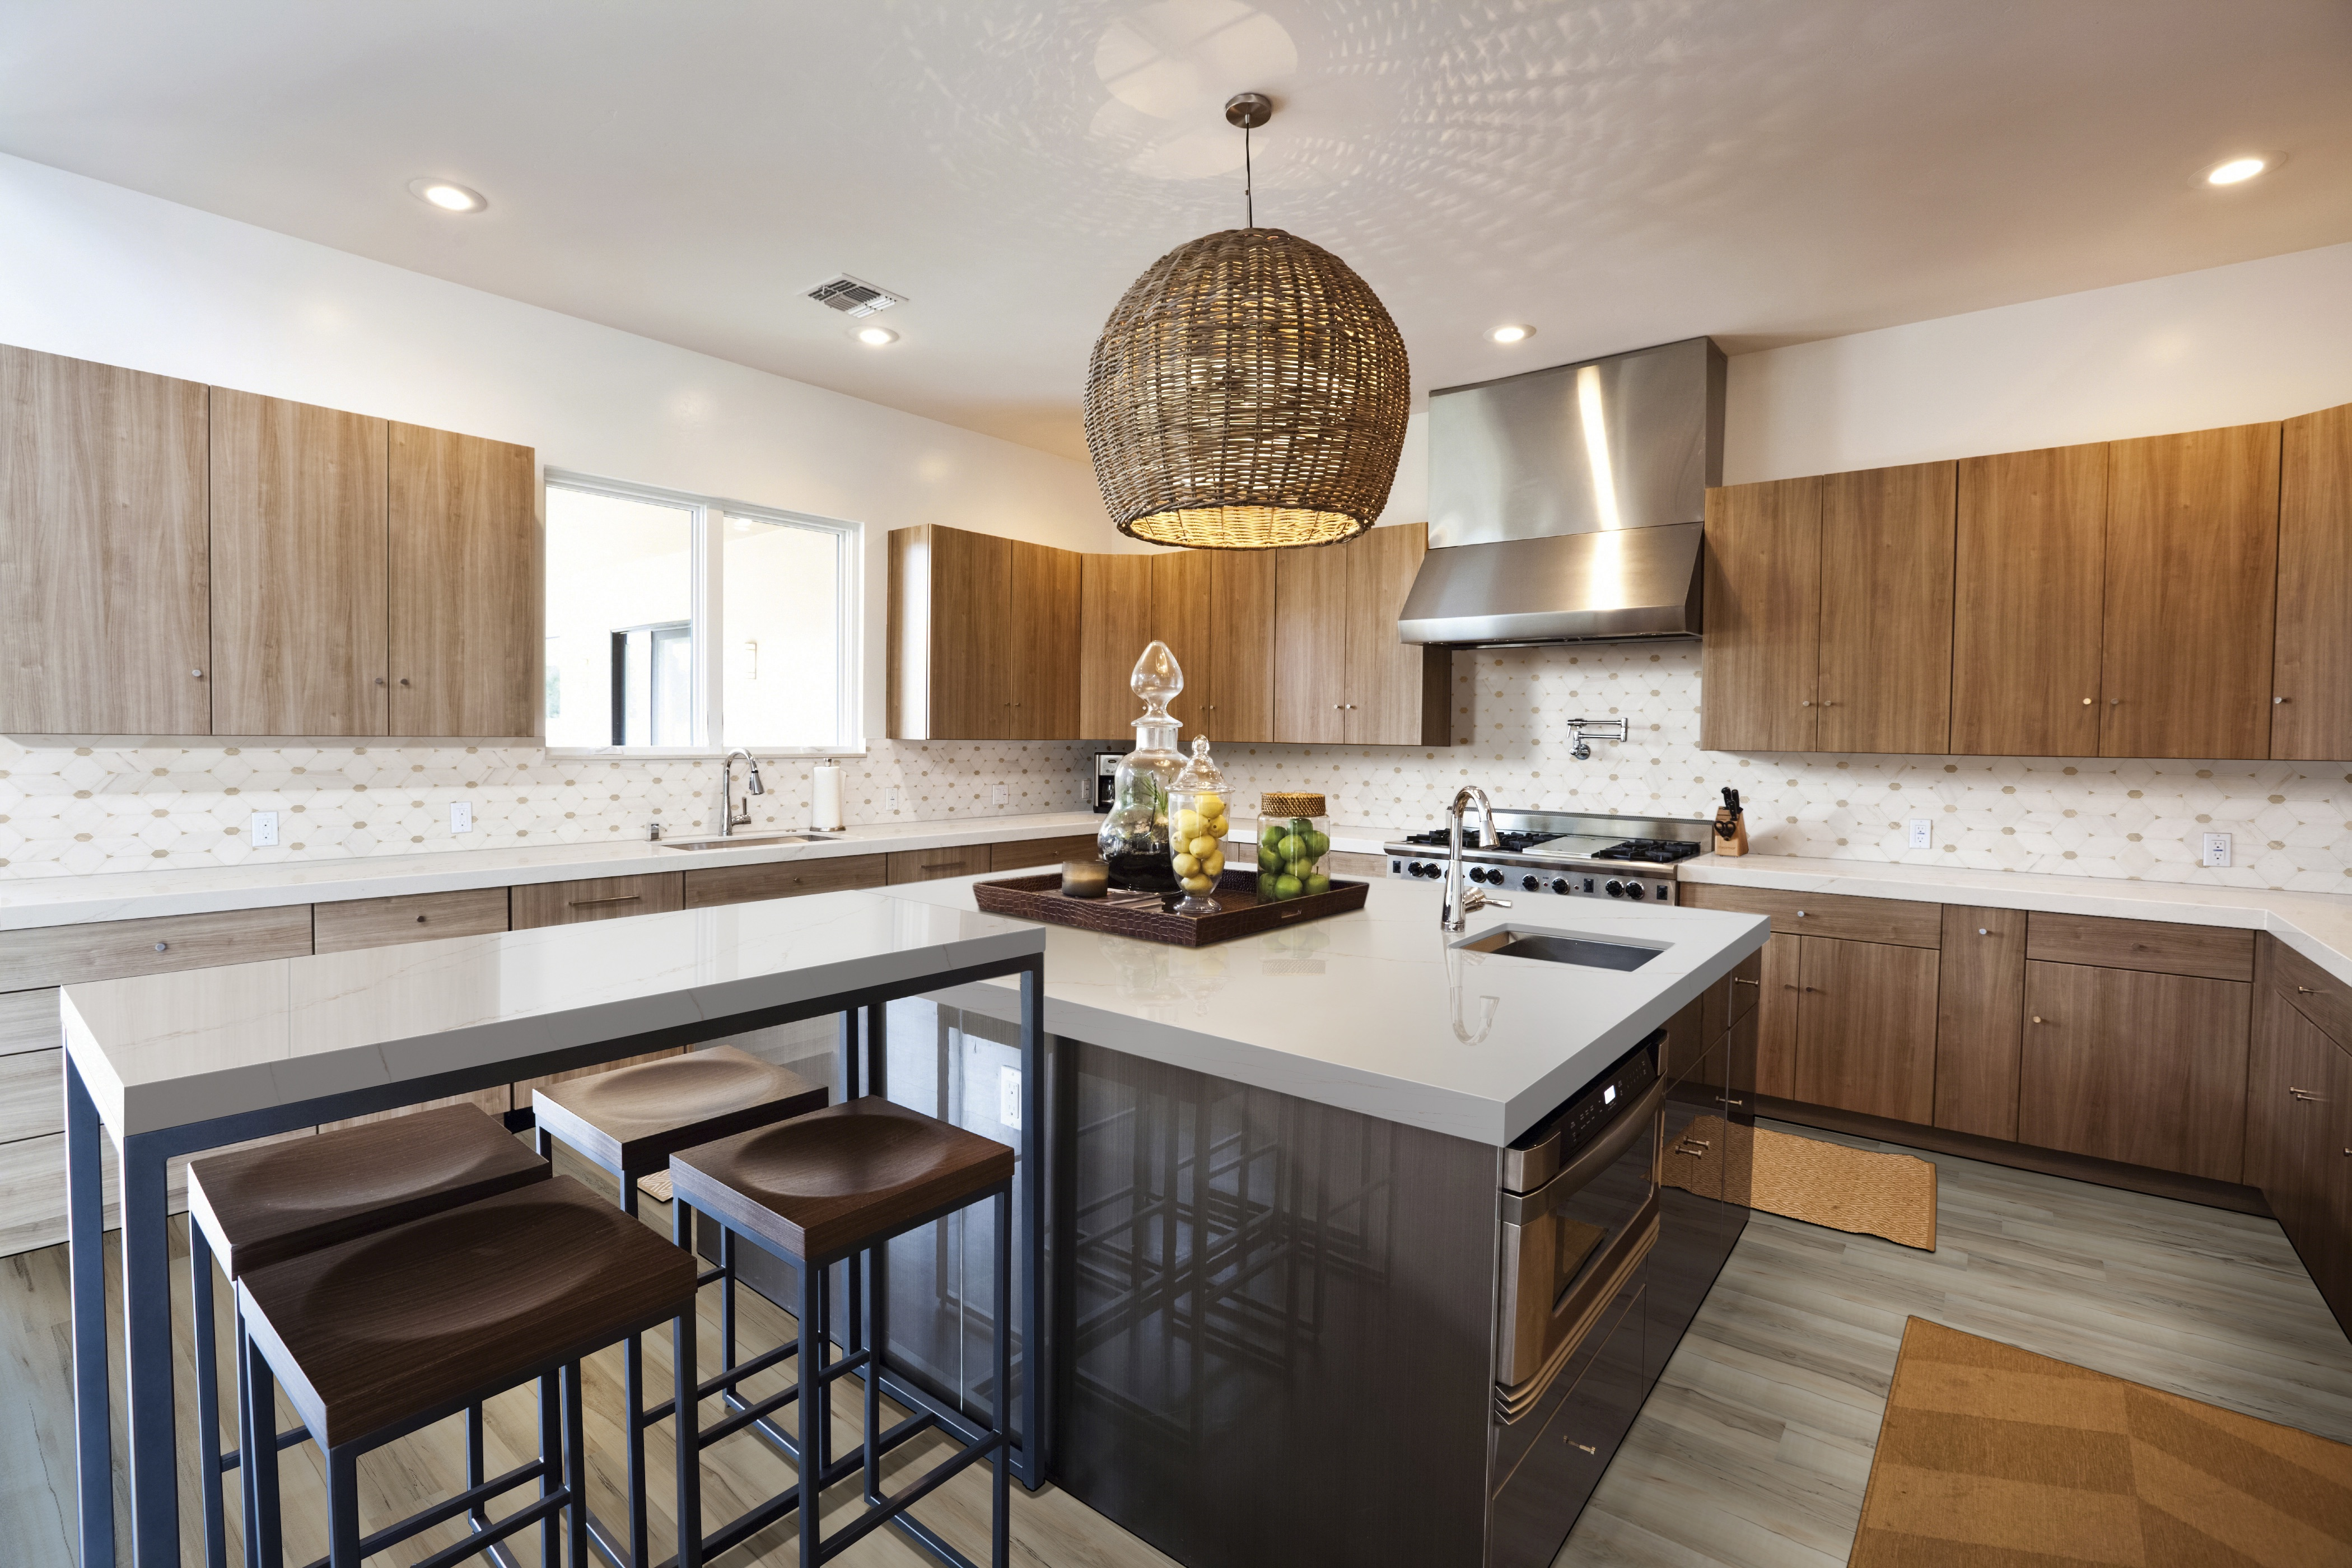 calacatta orno neutral kitchen with quartz